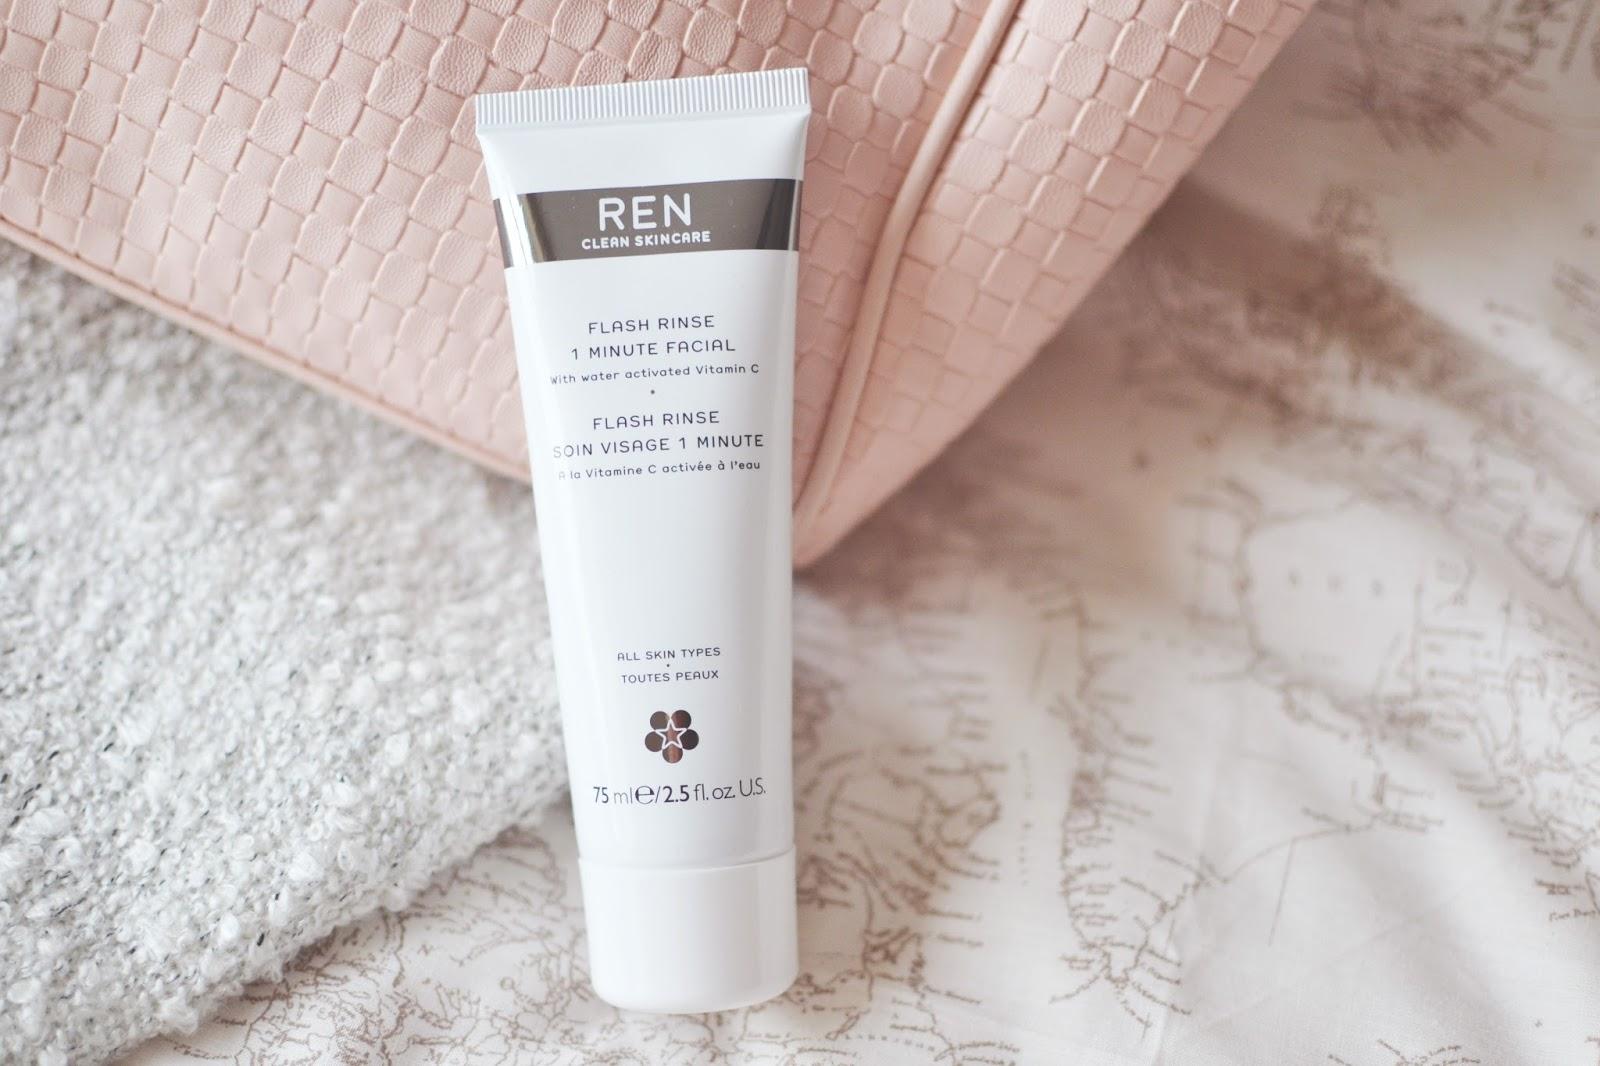 REN Flash Rinse 1 Minute Facial, REN Flash Rinse 1 Minute Facial review